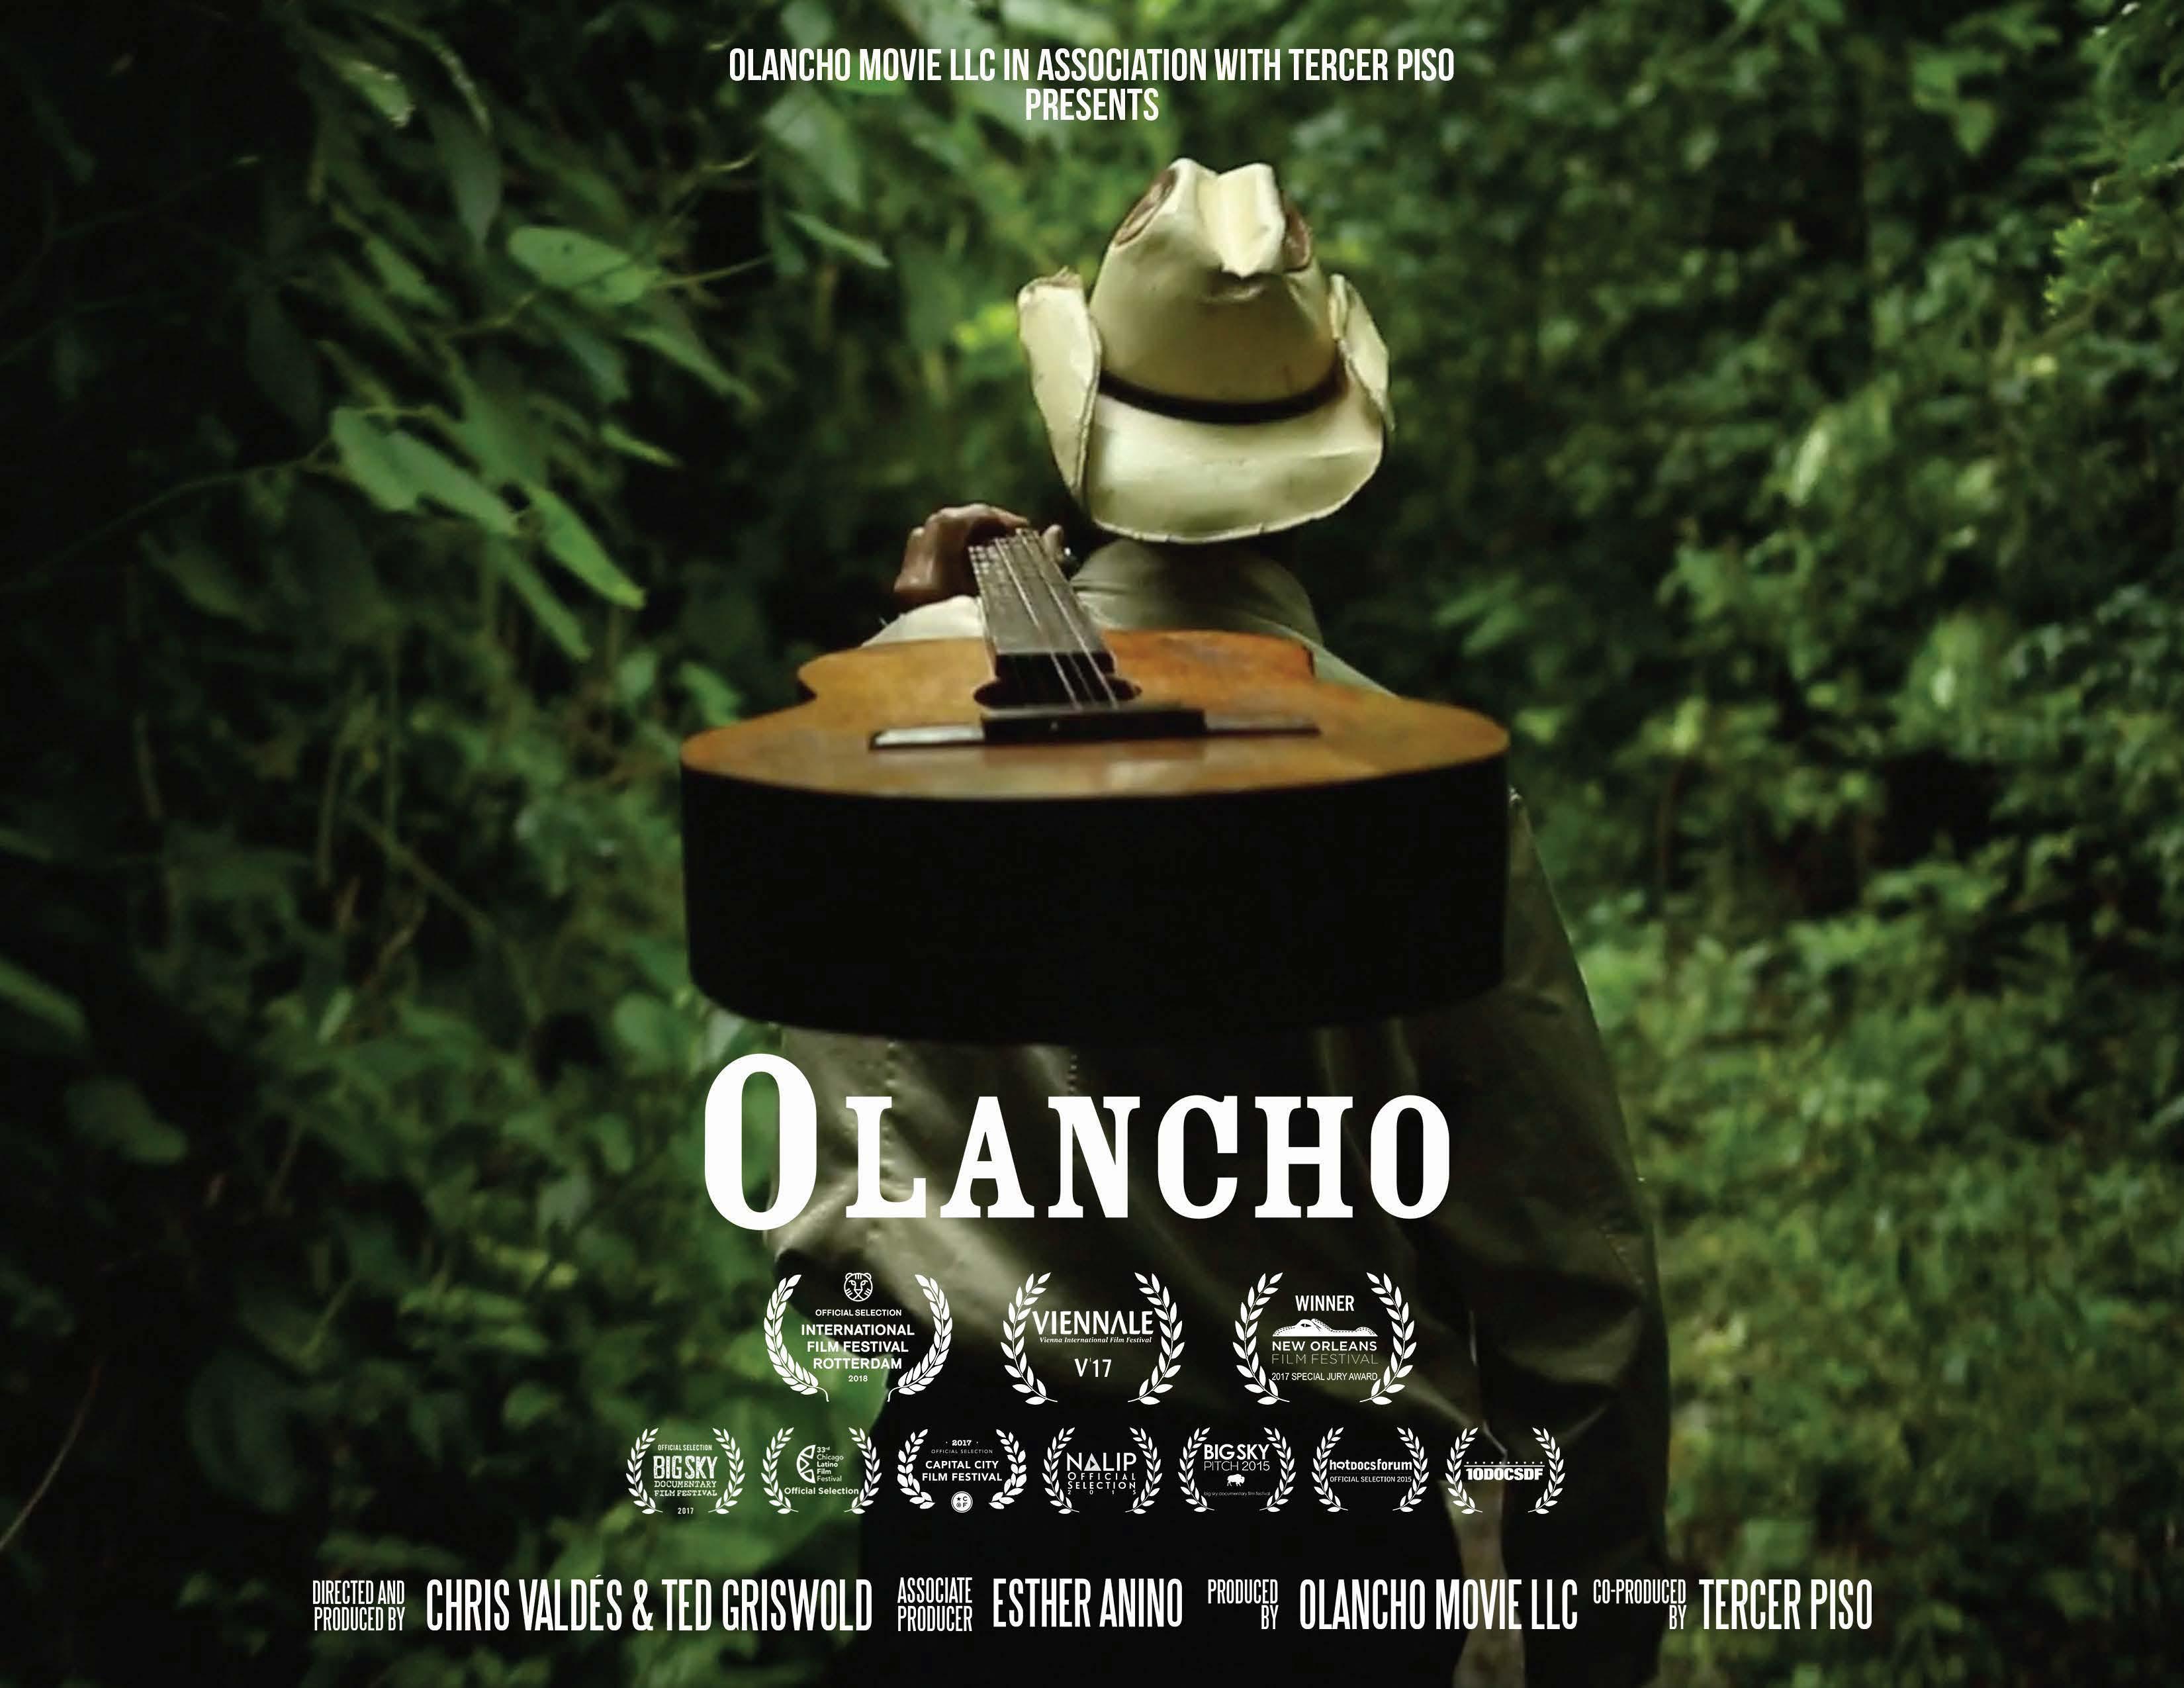 Olancho Film Poster